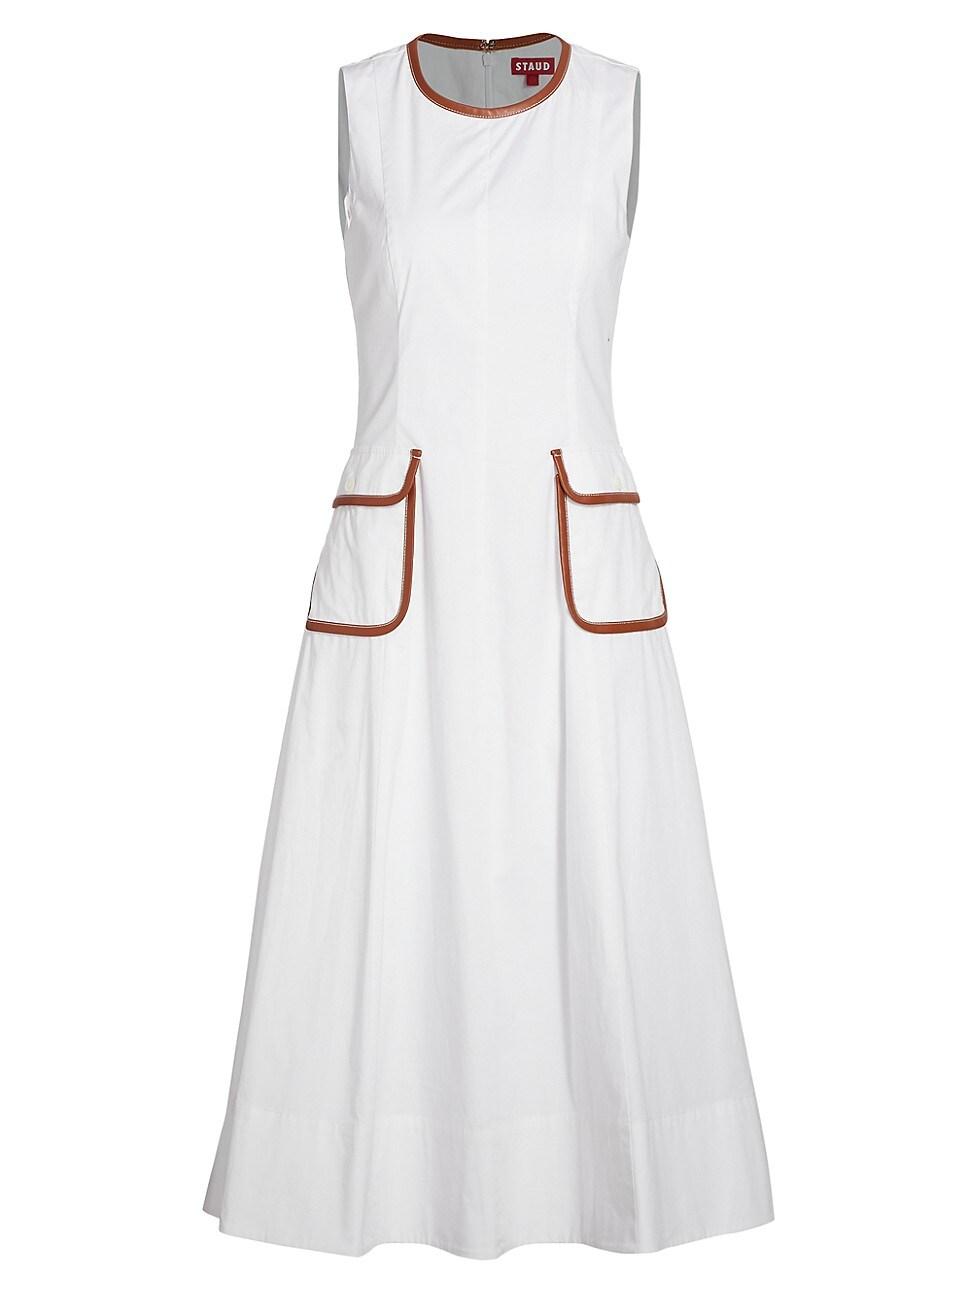 Staud WOMEN'S BAIT FAUX LEATHER-TRIM POCKET DRESS